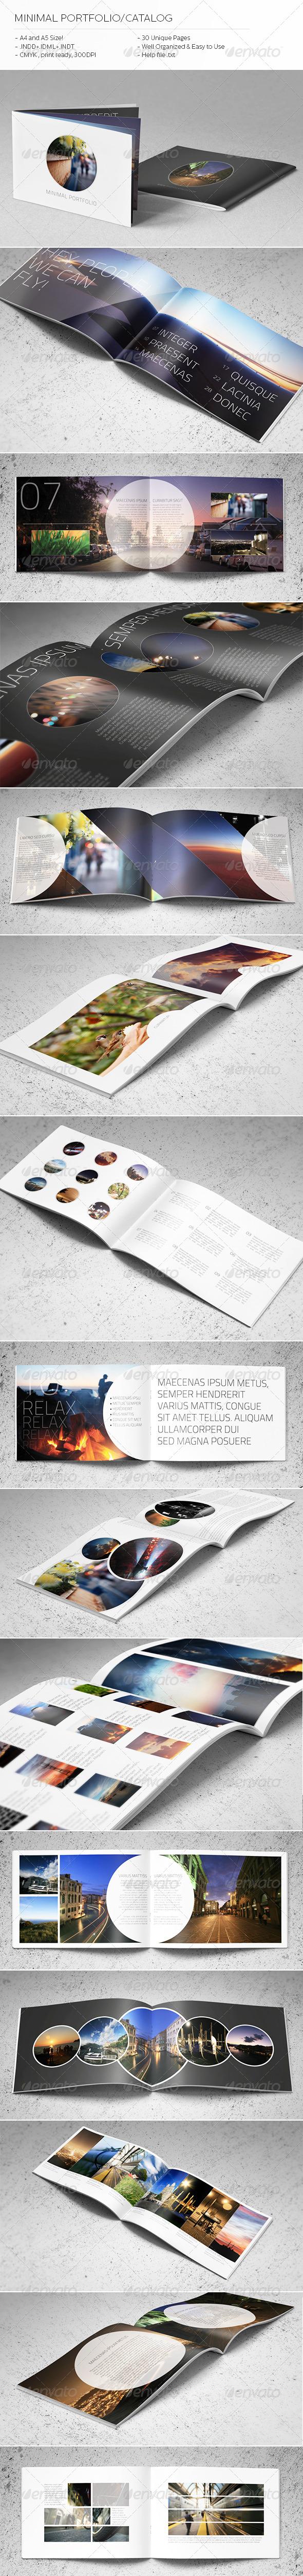 Minimal Catalog/Portfolio Template - Brochures Print Templates